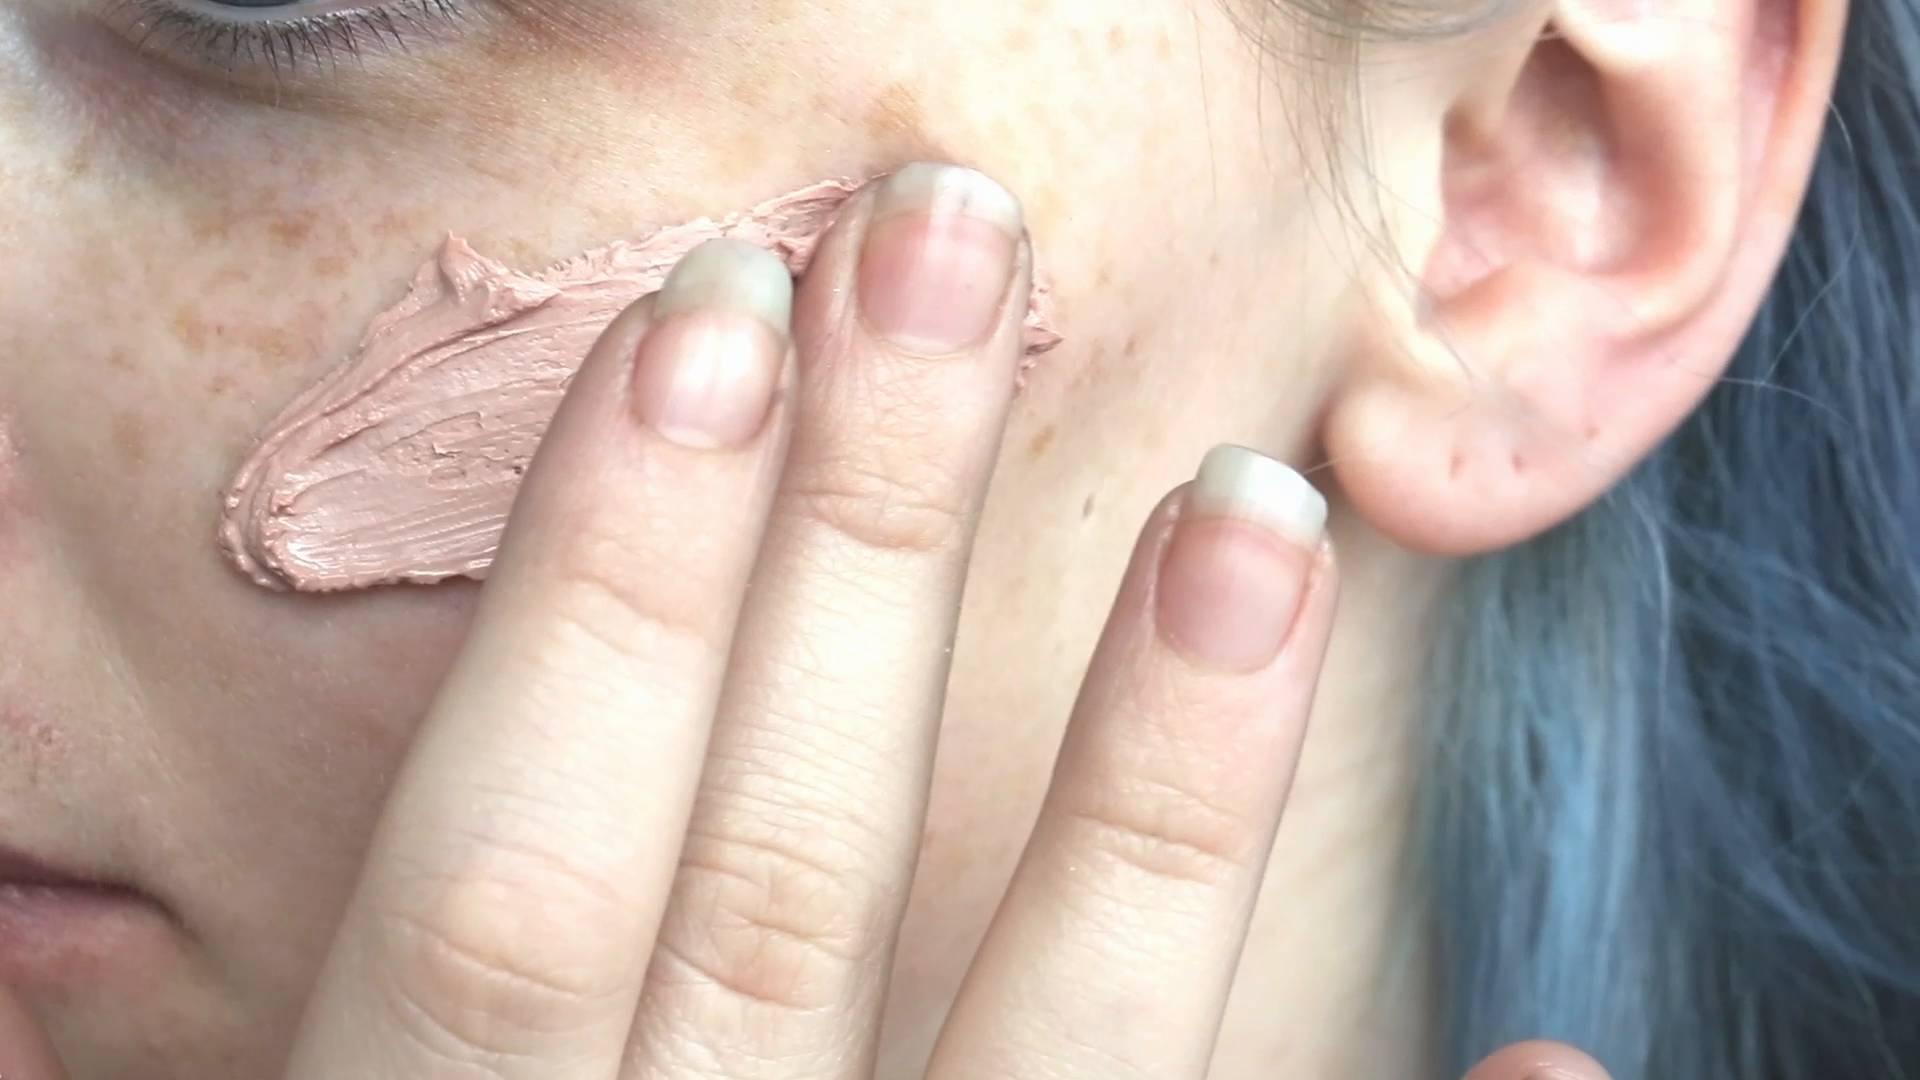 Lush Cosmetics - Rosy Cheeks Mask